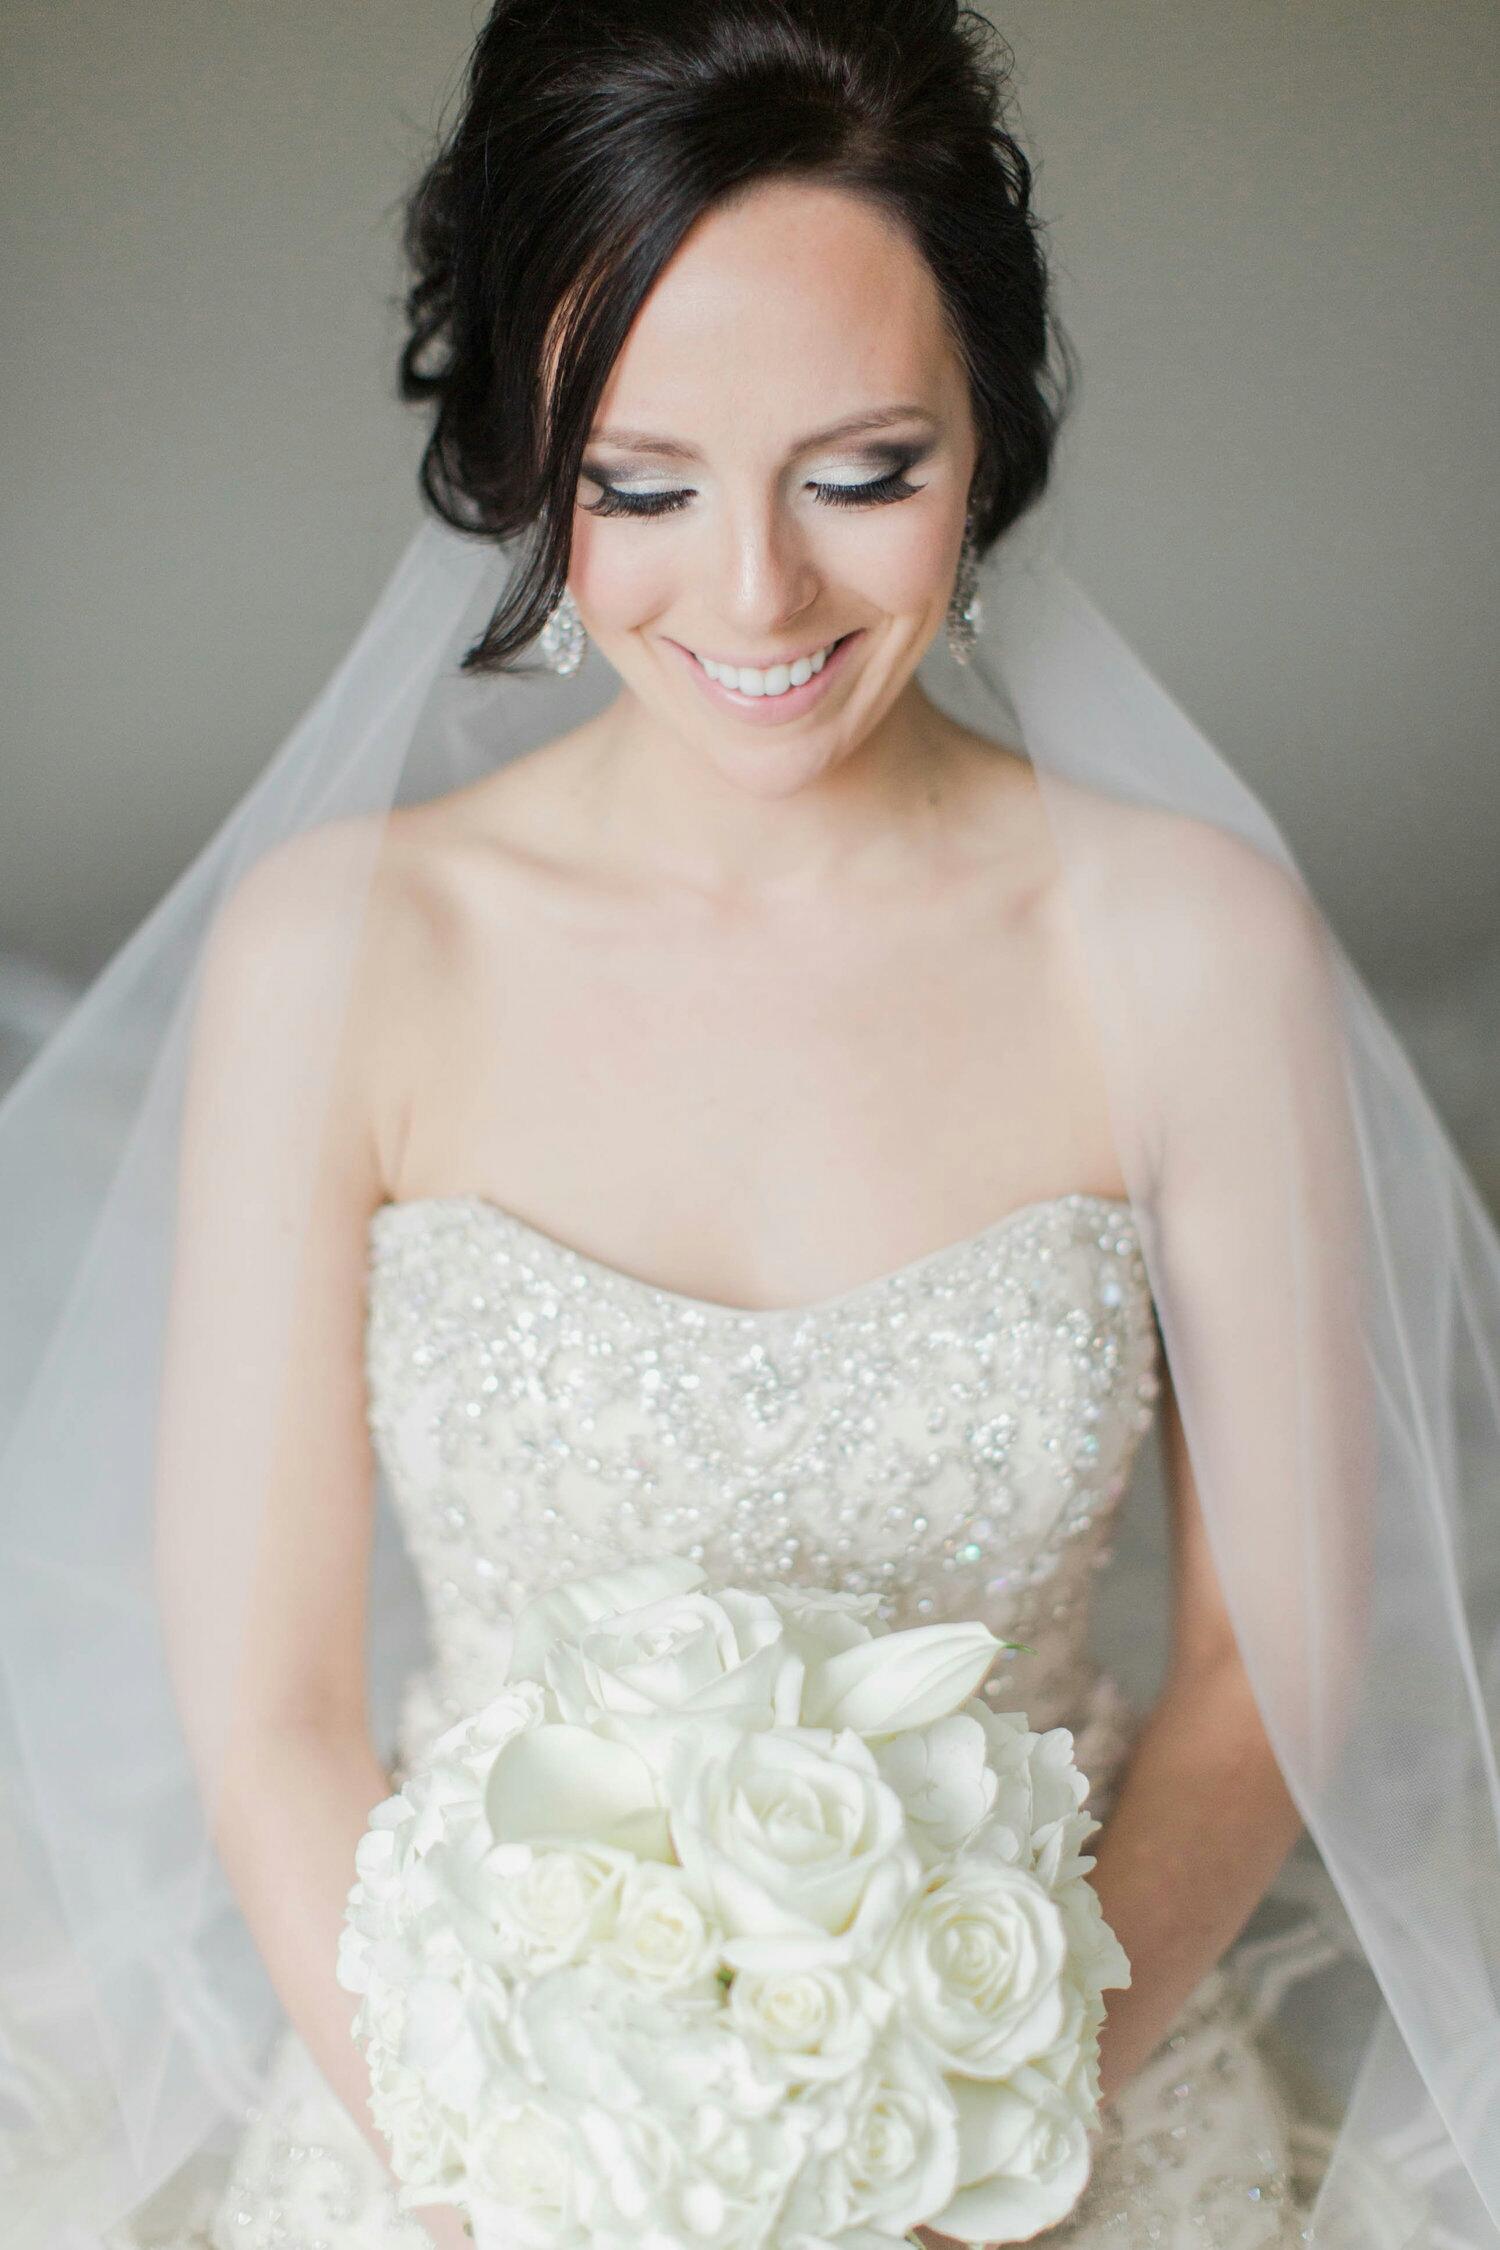 Bridal makeup and hair Ancaster Ontario